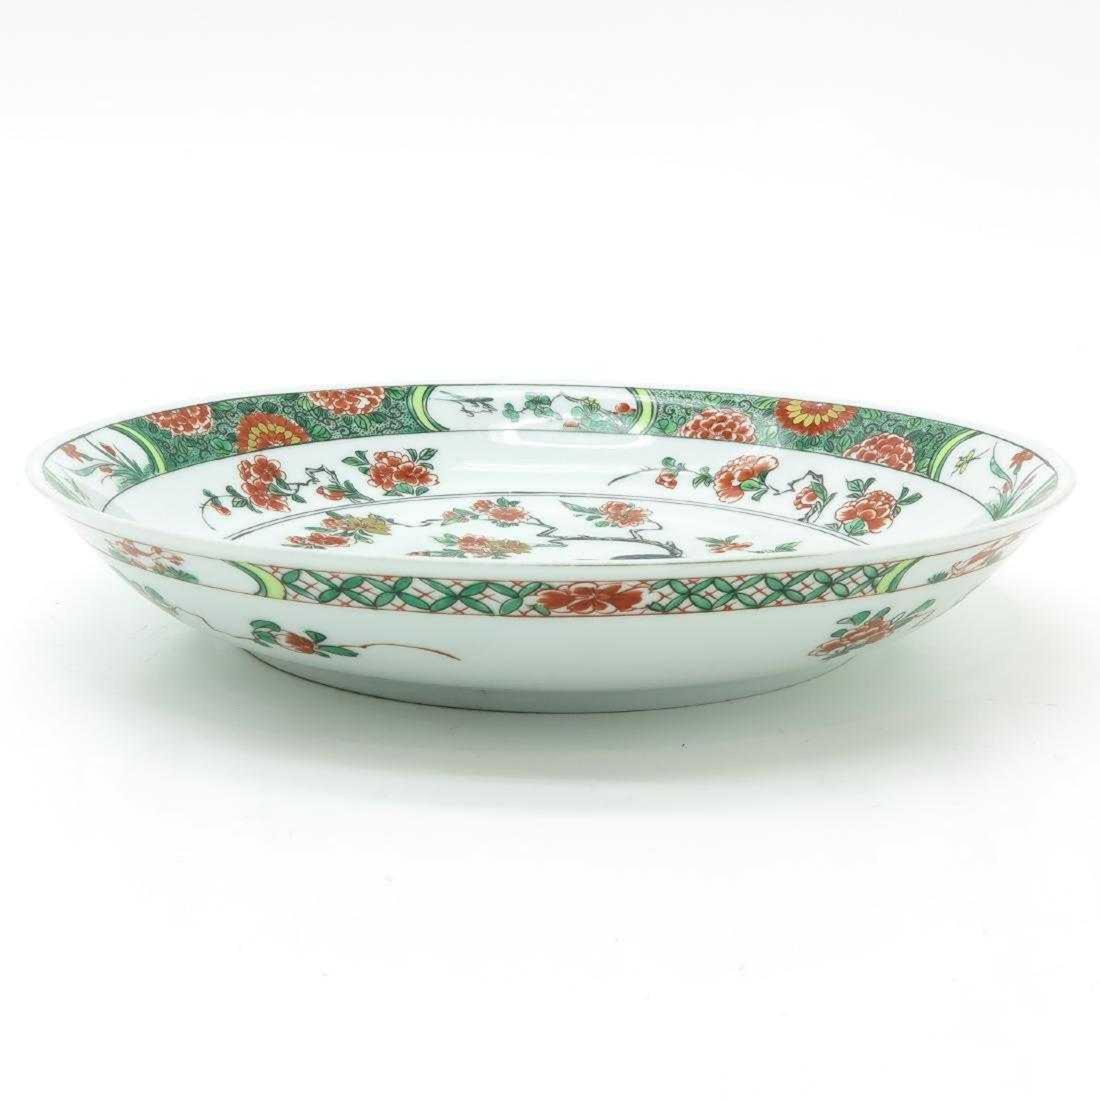 Polychrome Decor Porcelain Plate - 3